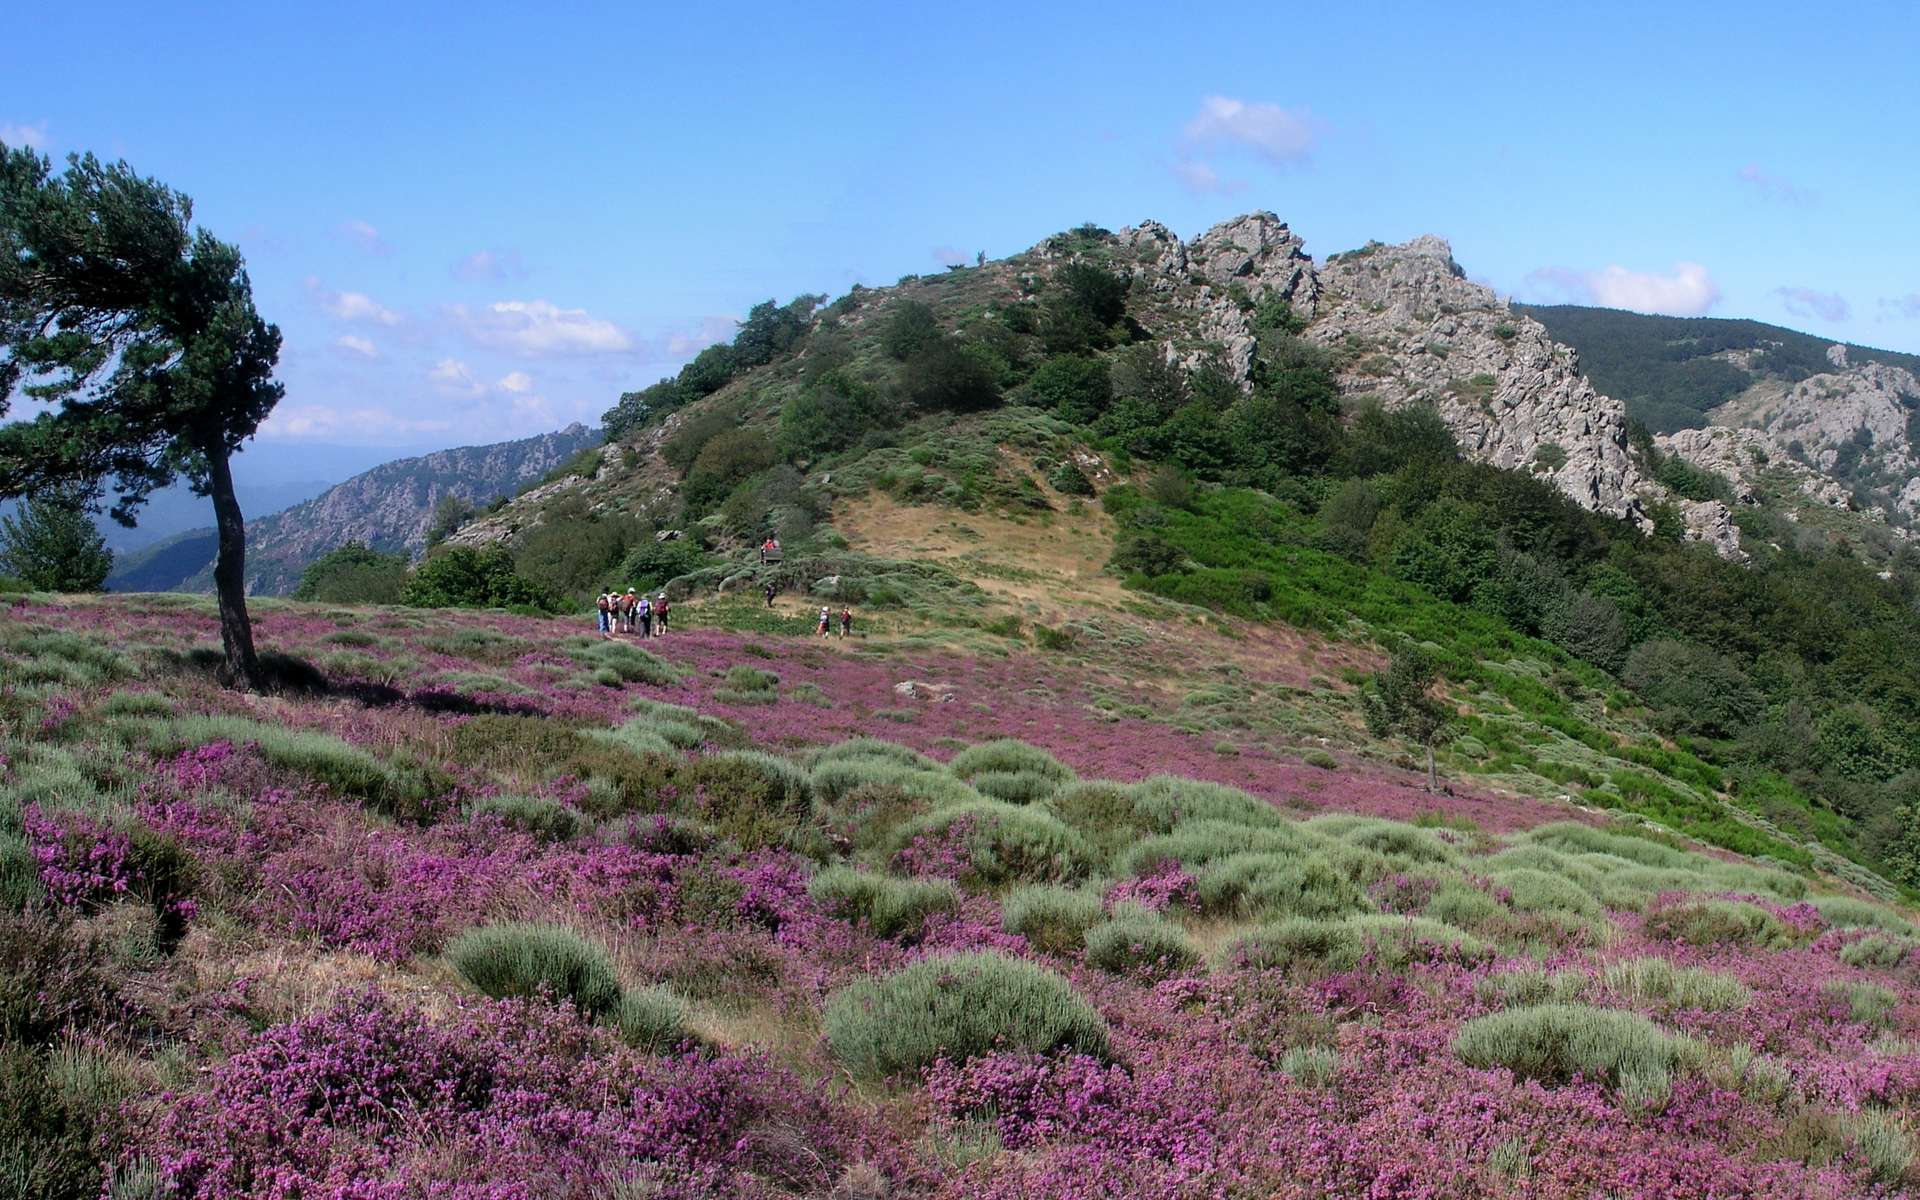 parc naturel regional du haut languedoc